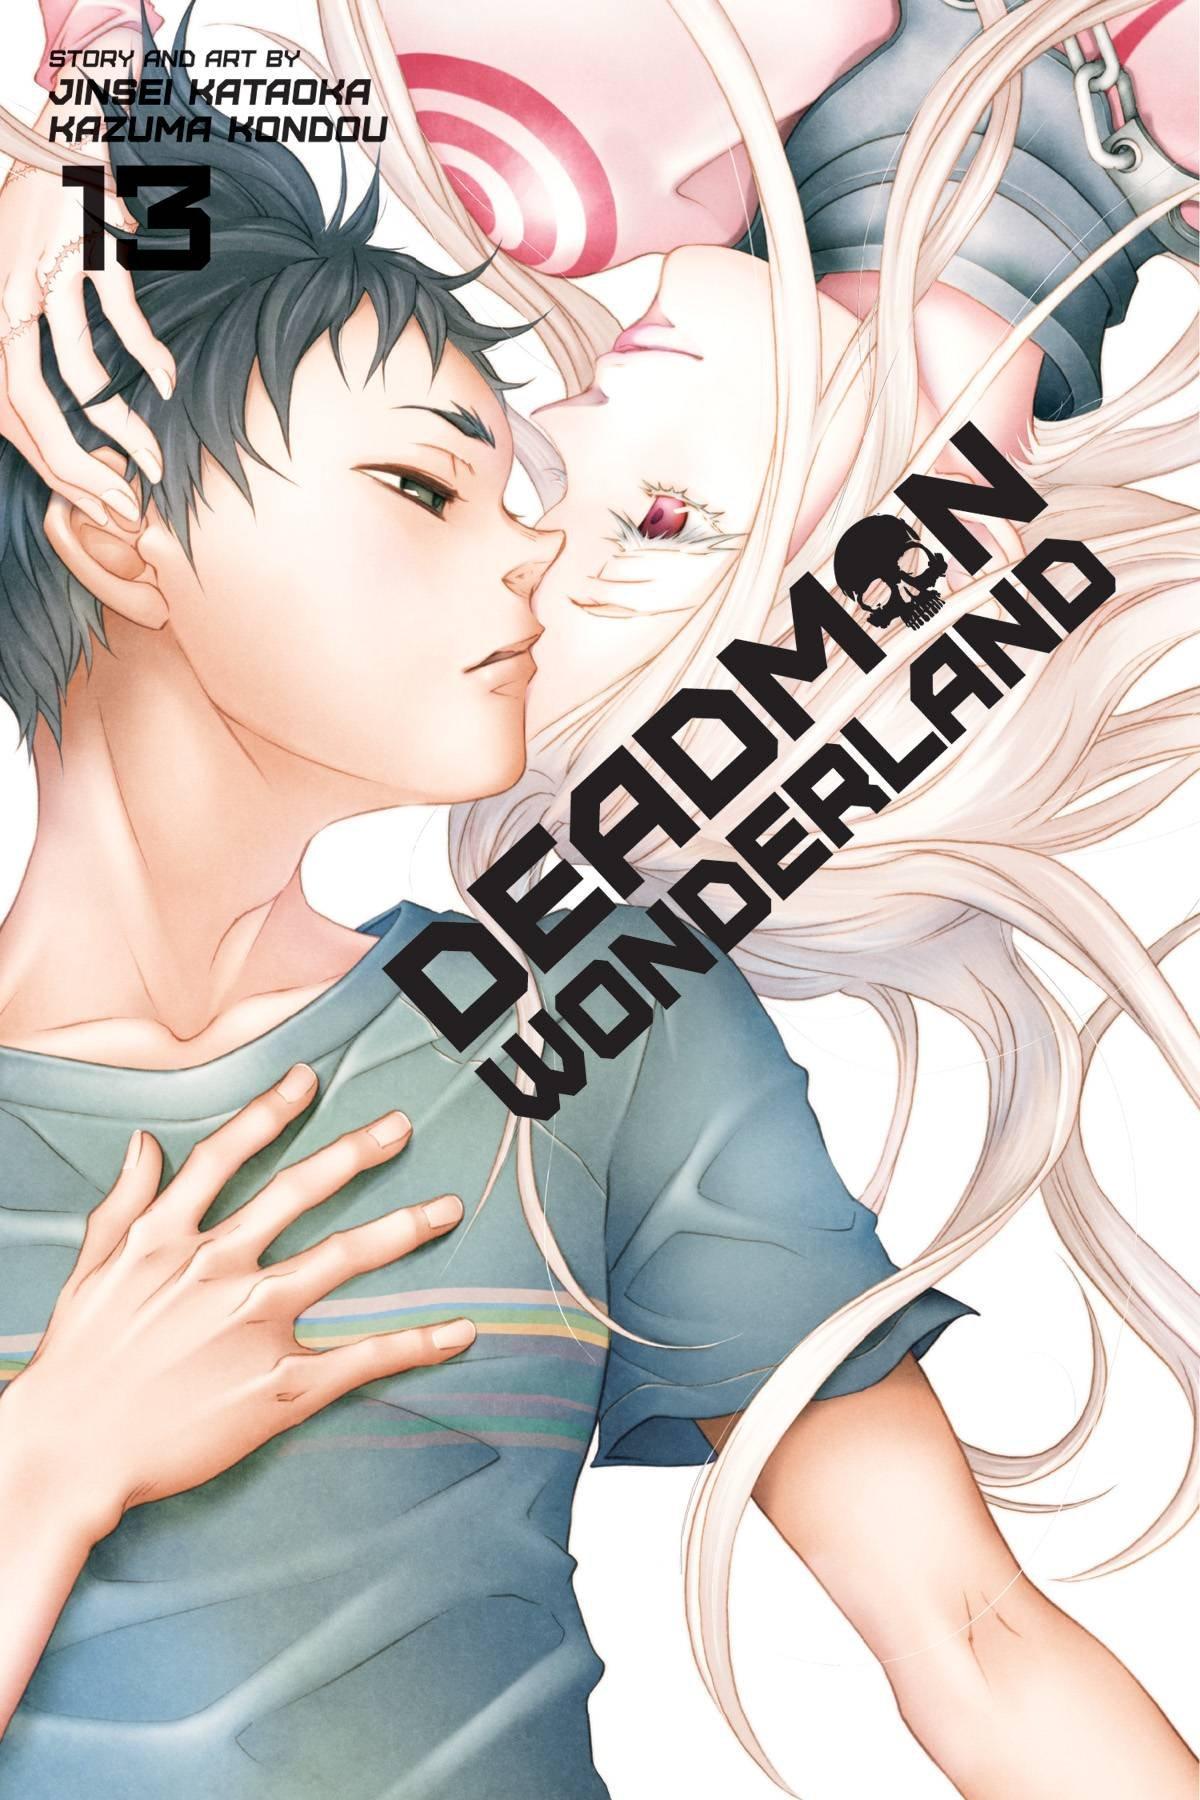 Deadman Wonderland, Vol. 13 ebook